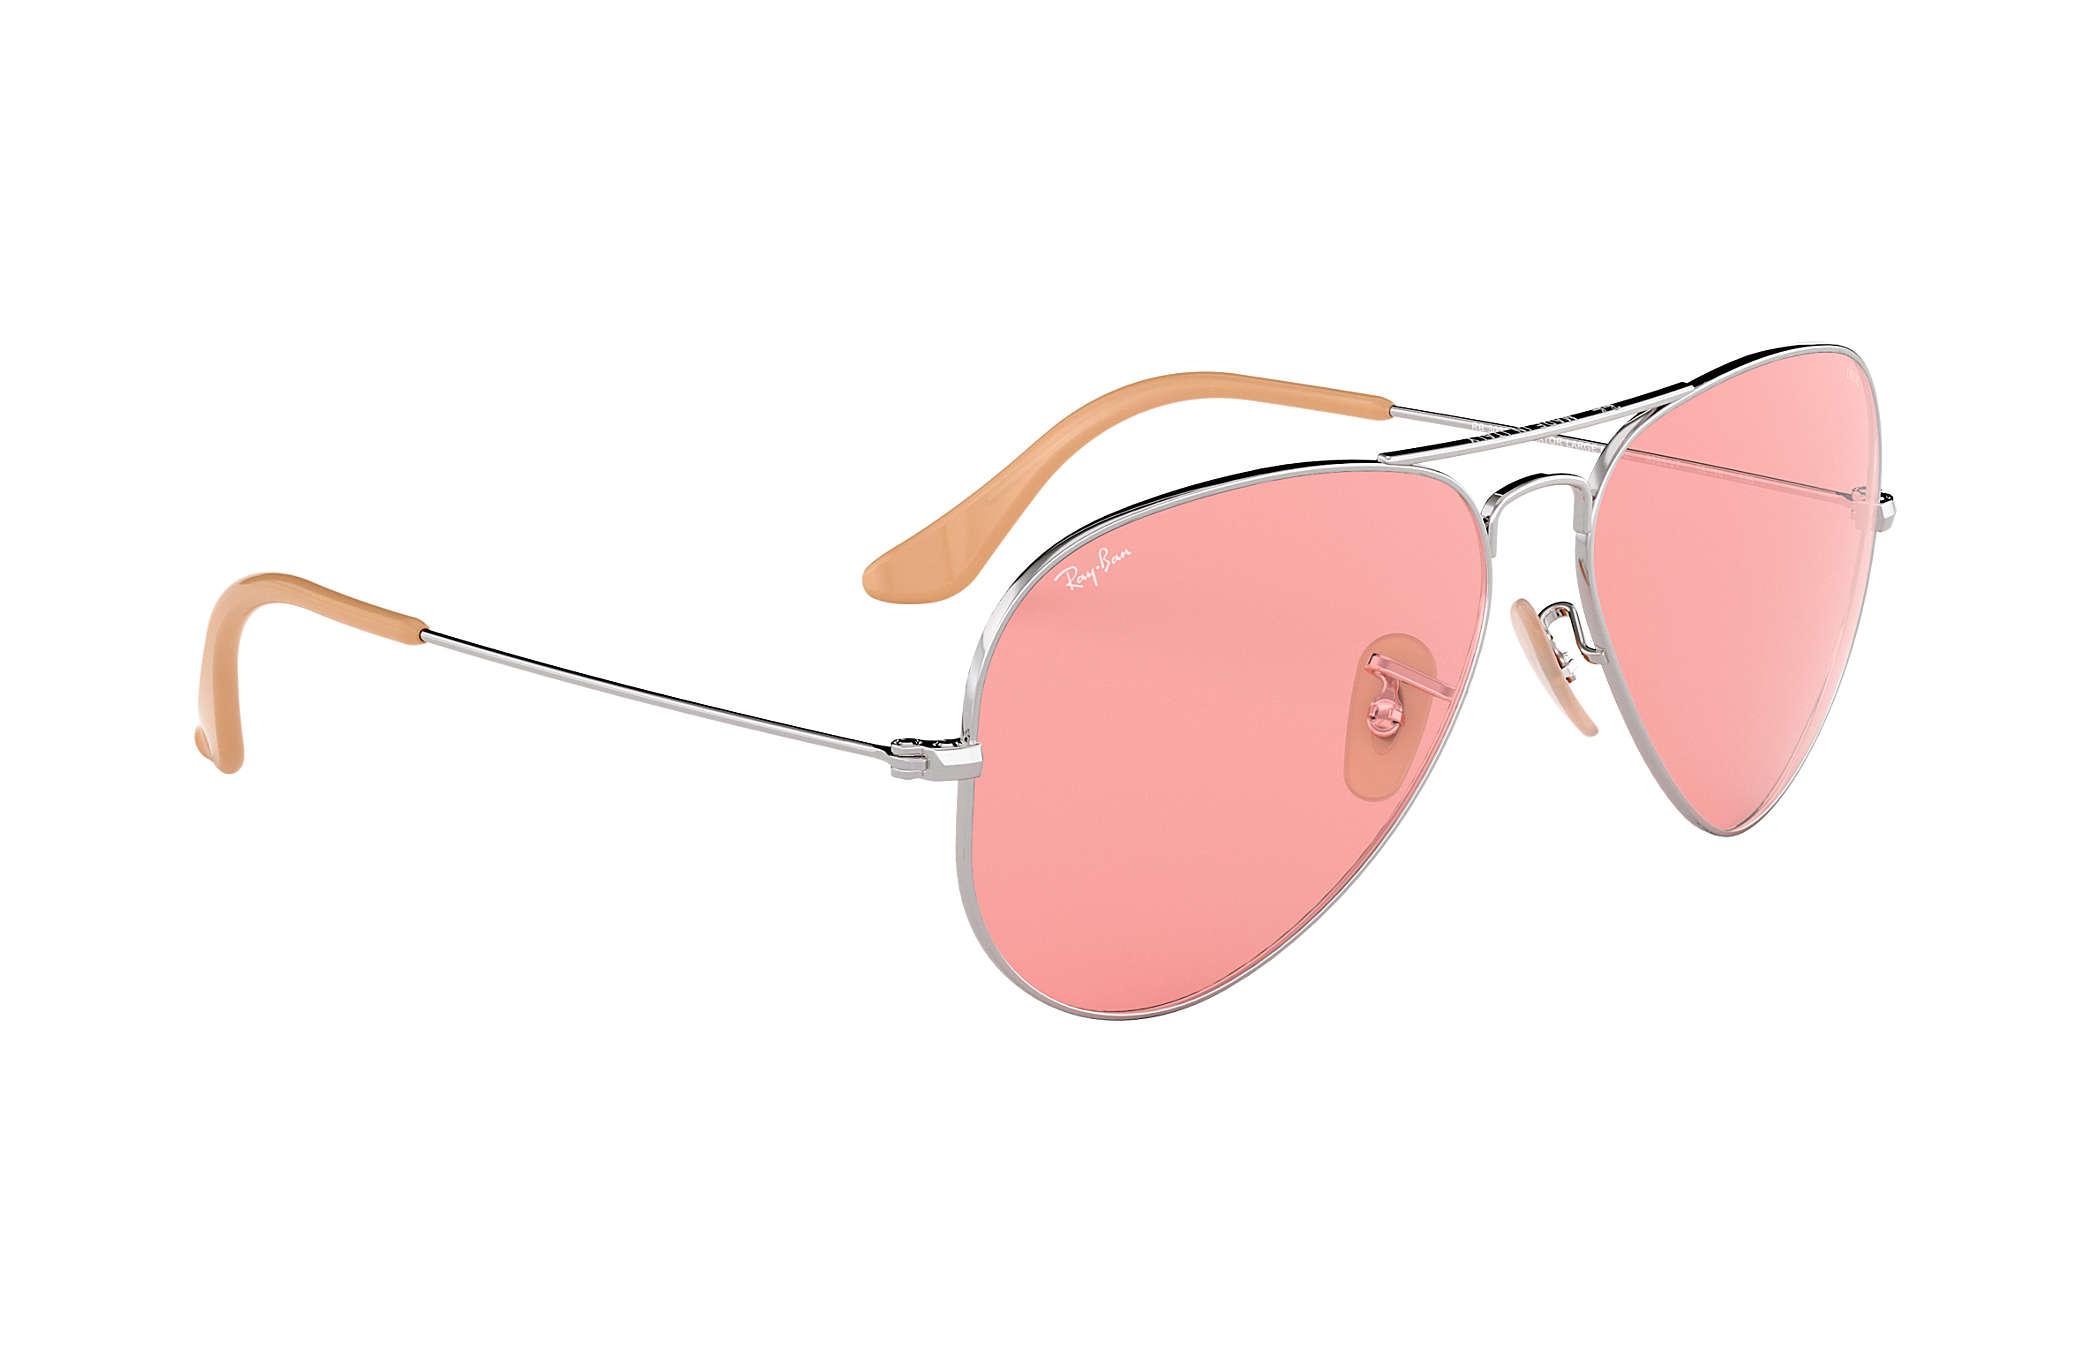 fd396e8640bb7 Ray-Ban Aviator Evolve RB3025 Silver - Metal - Pink Lenses ...